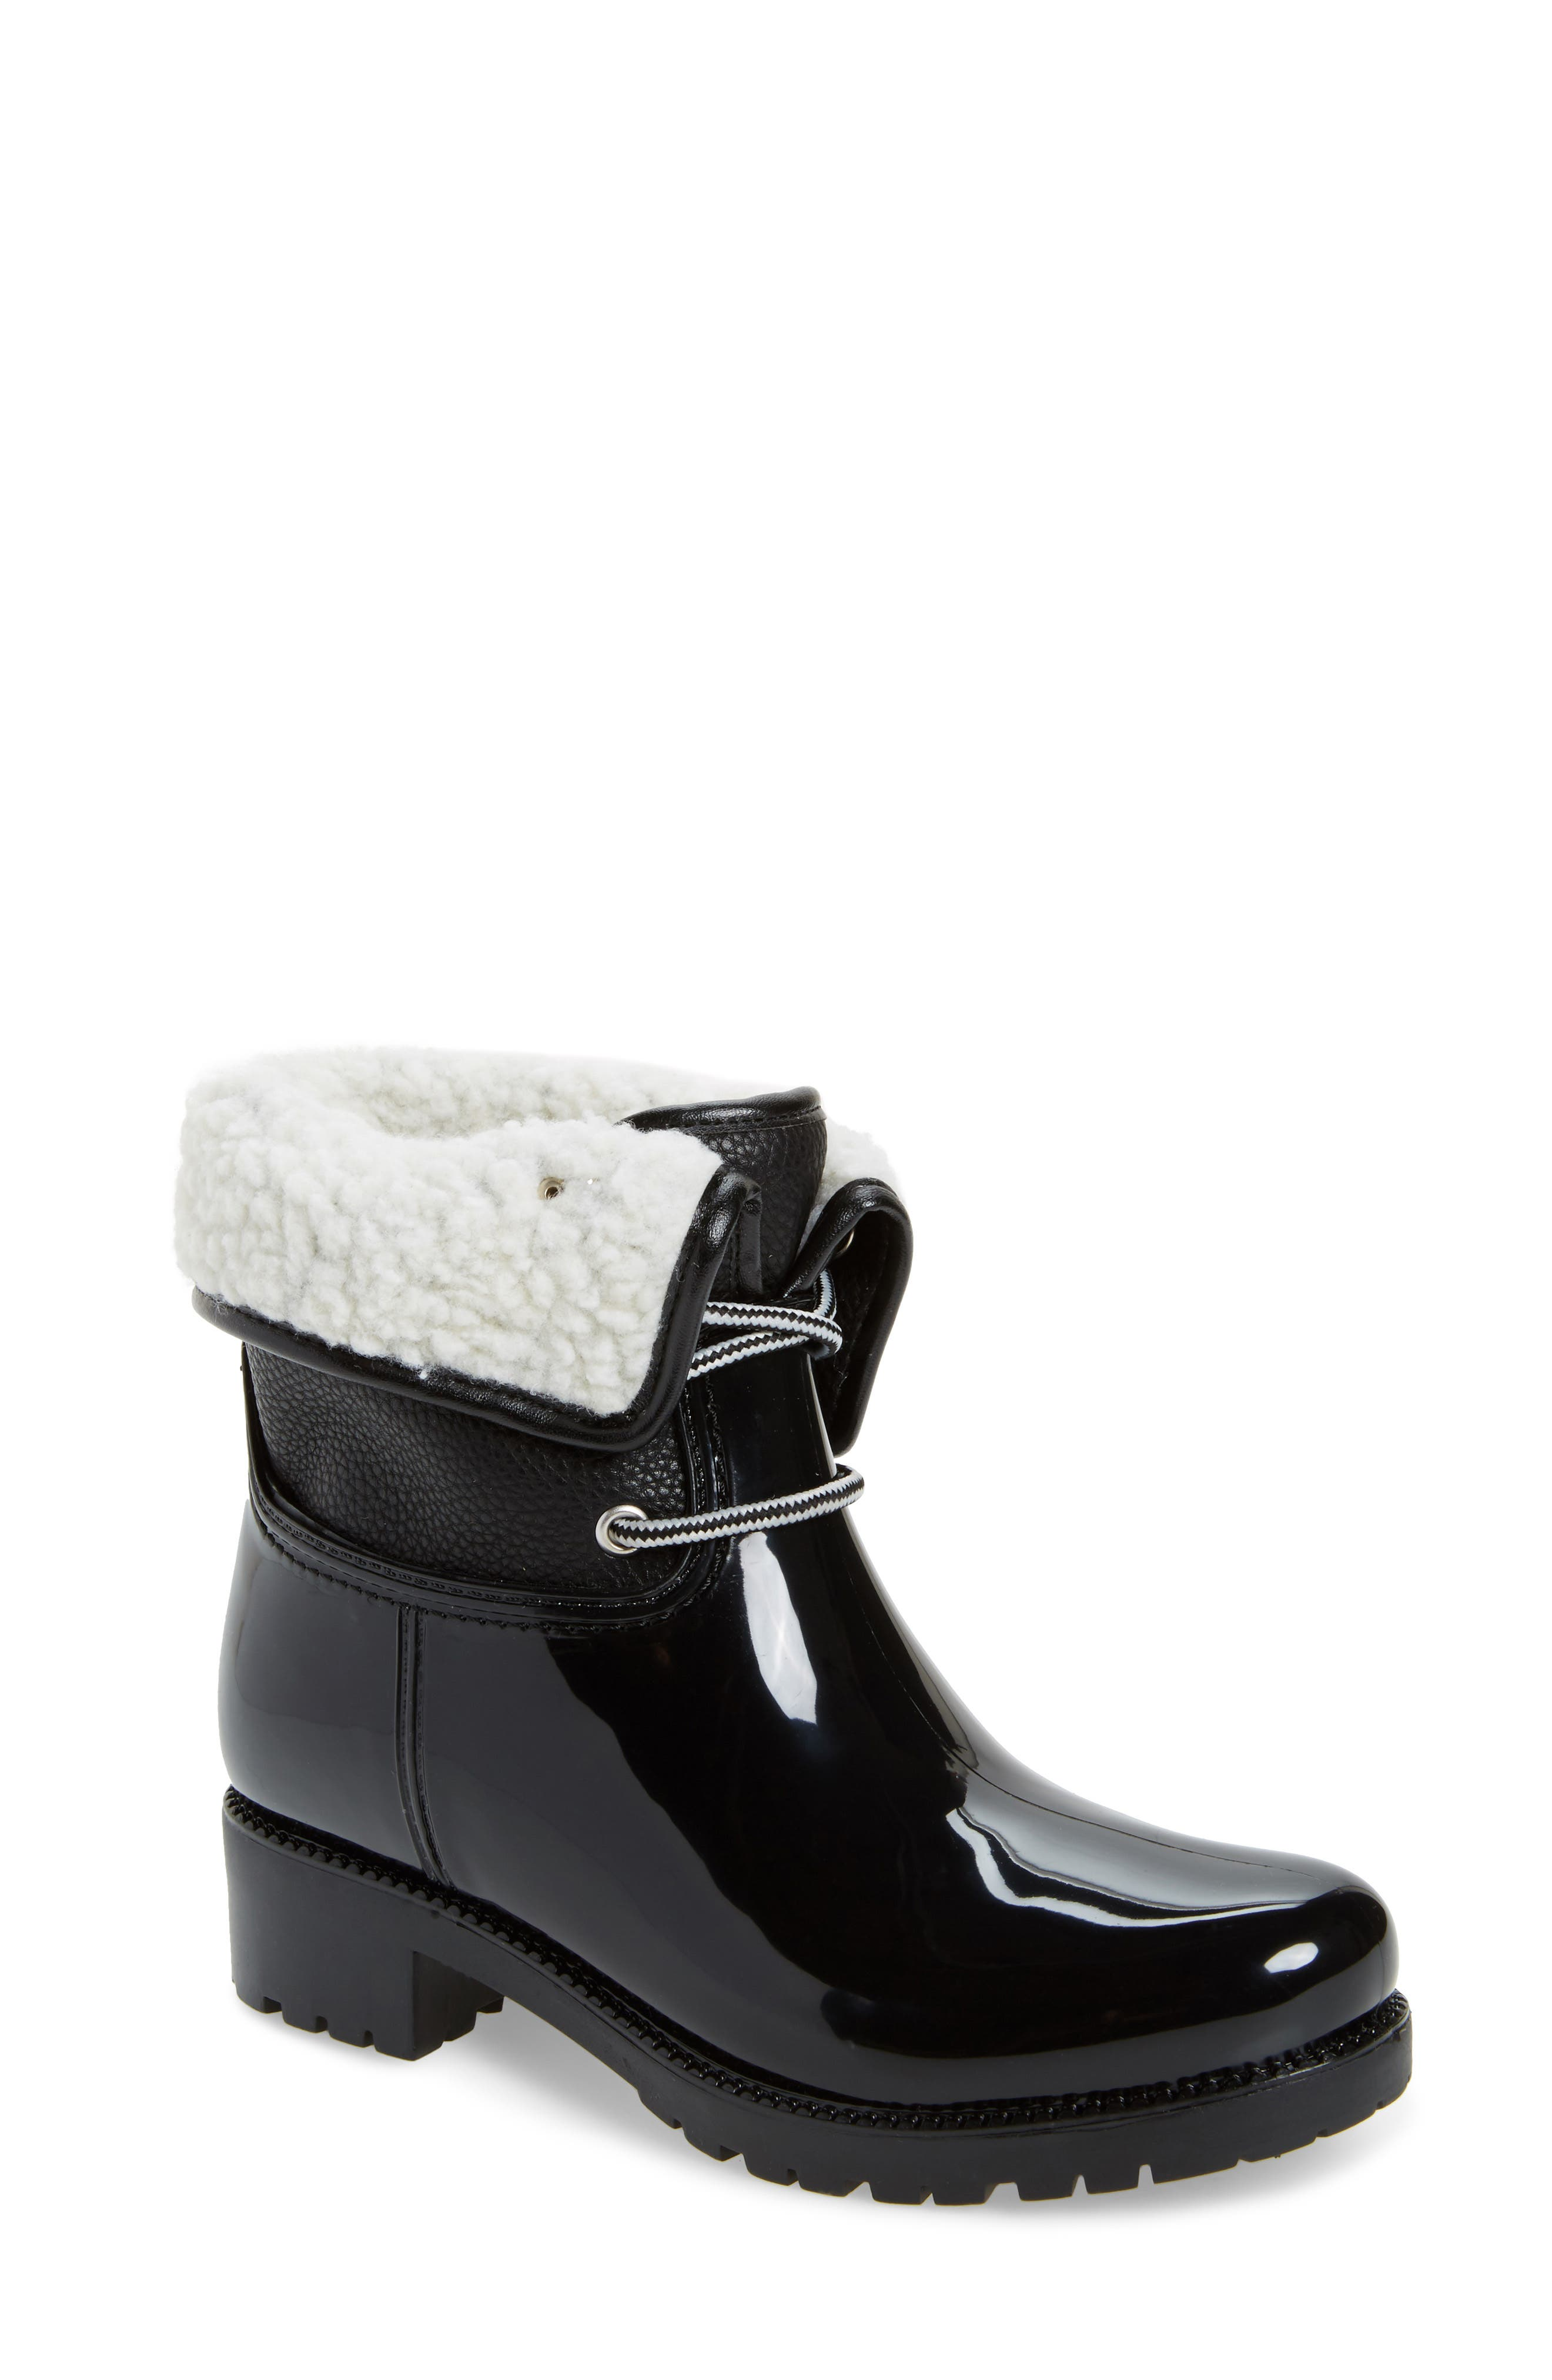 Calgary Faux Shearling Water Resistant Boot,                         Main,                         color, BLACK